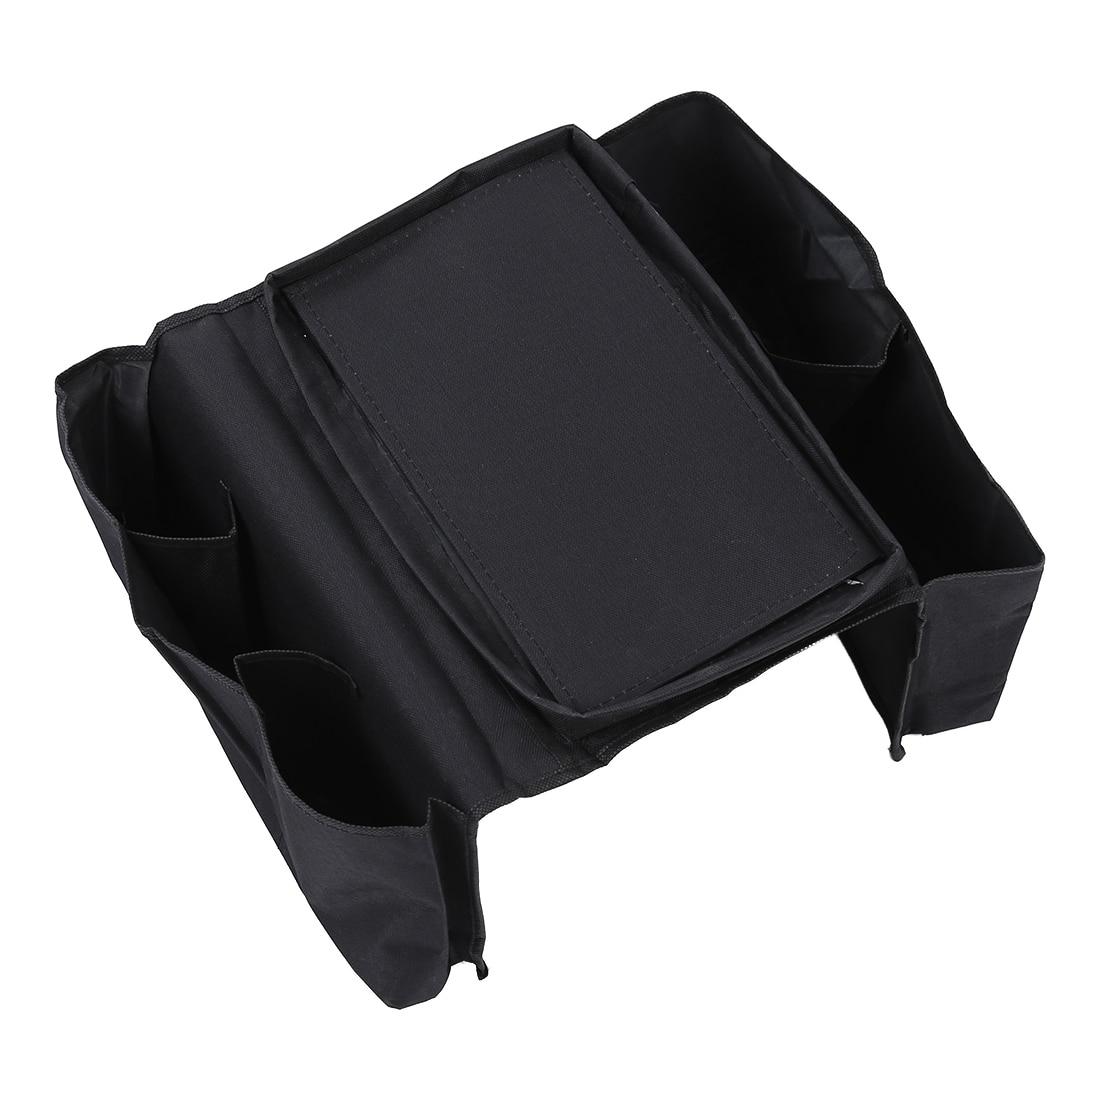 Grote 6 Pocket Sofa Couch Arm Rest Remote Caddy Organiser Fijn Vakmanschap